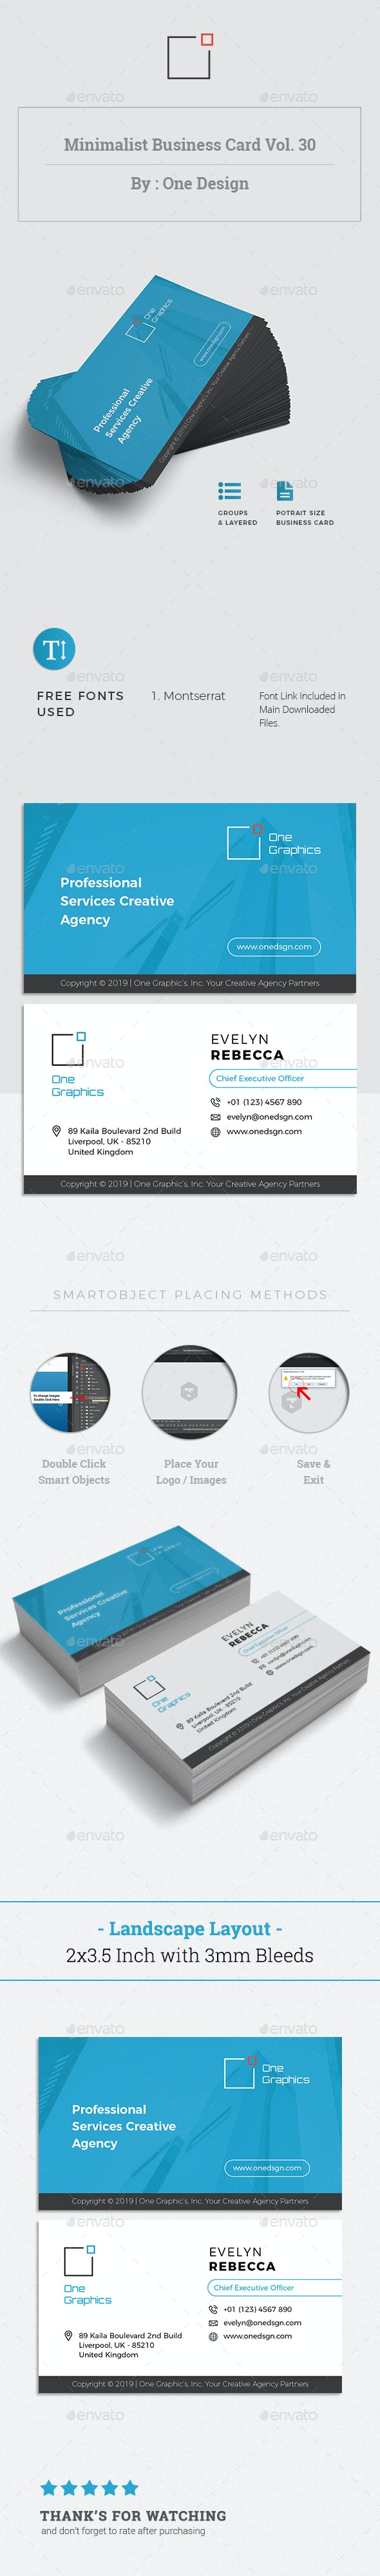 Minimalist Business Card Vol. 30 - Business Cards Print Templates